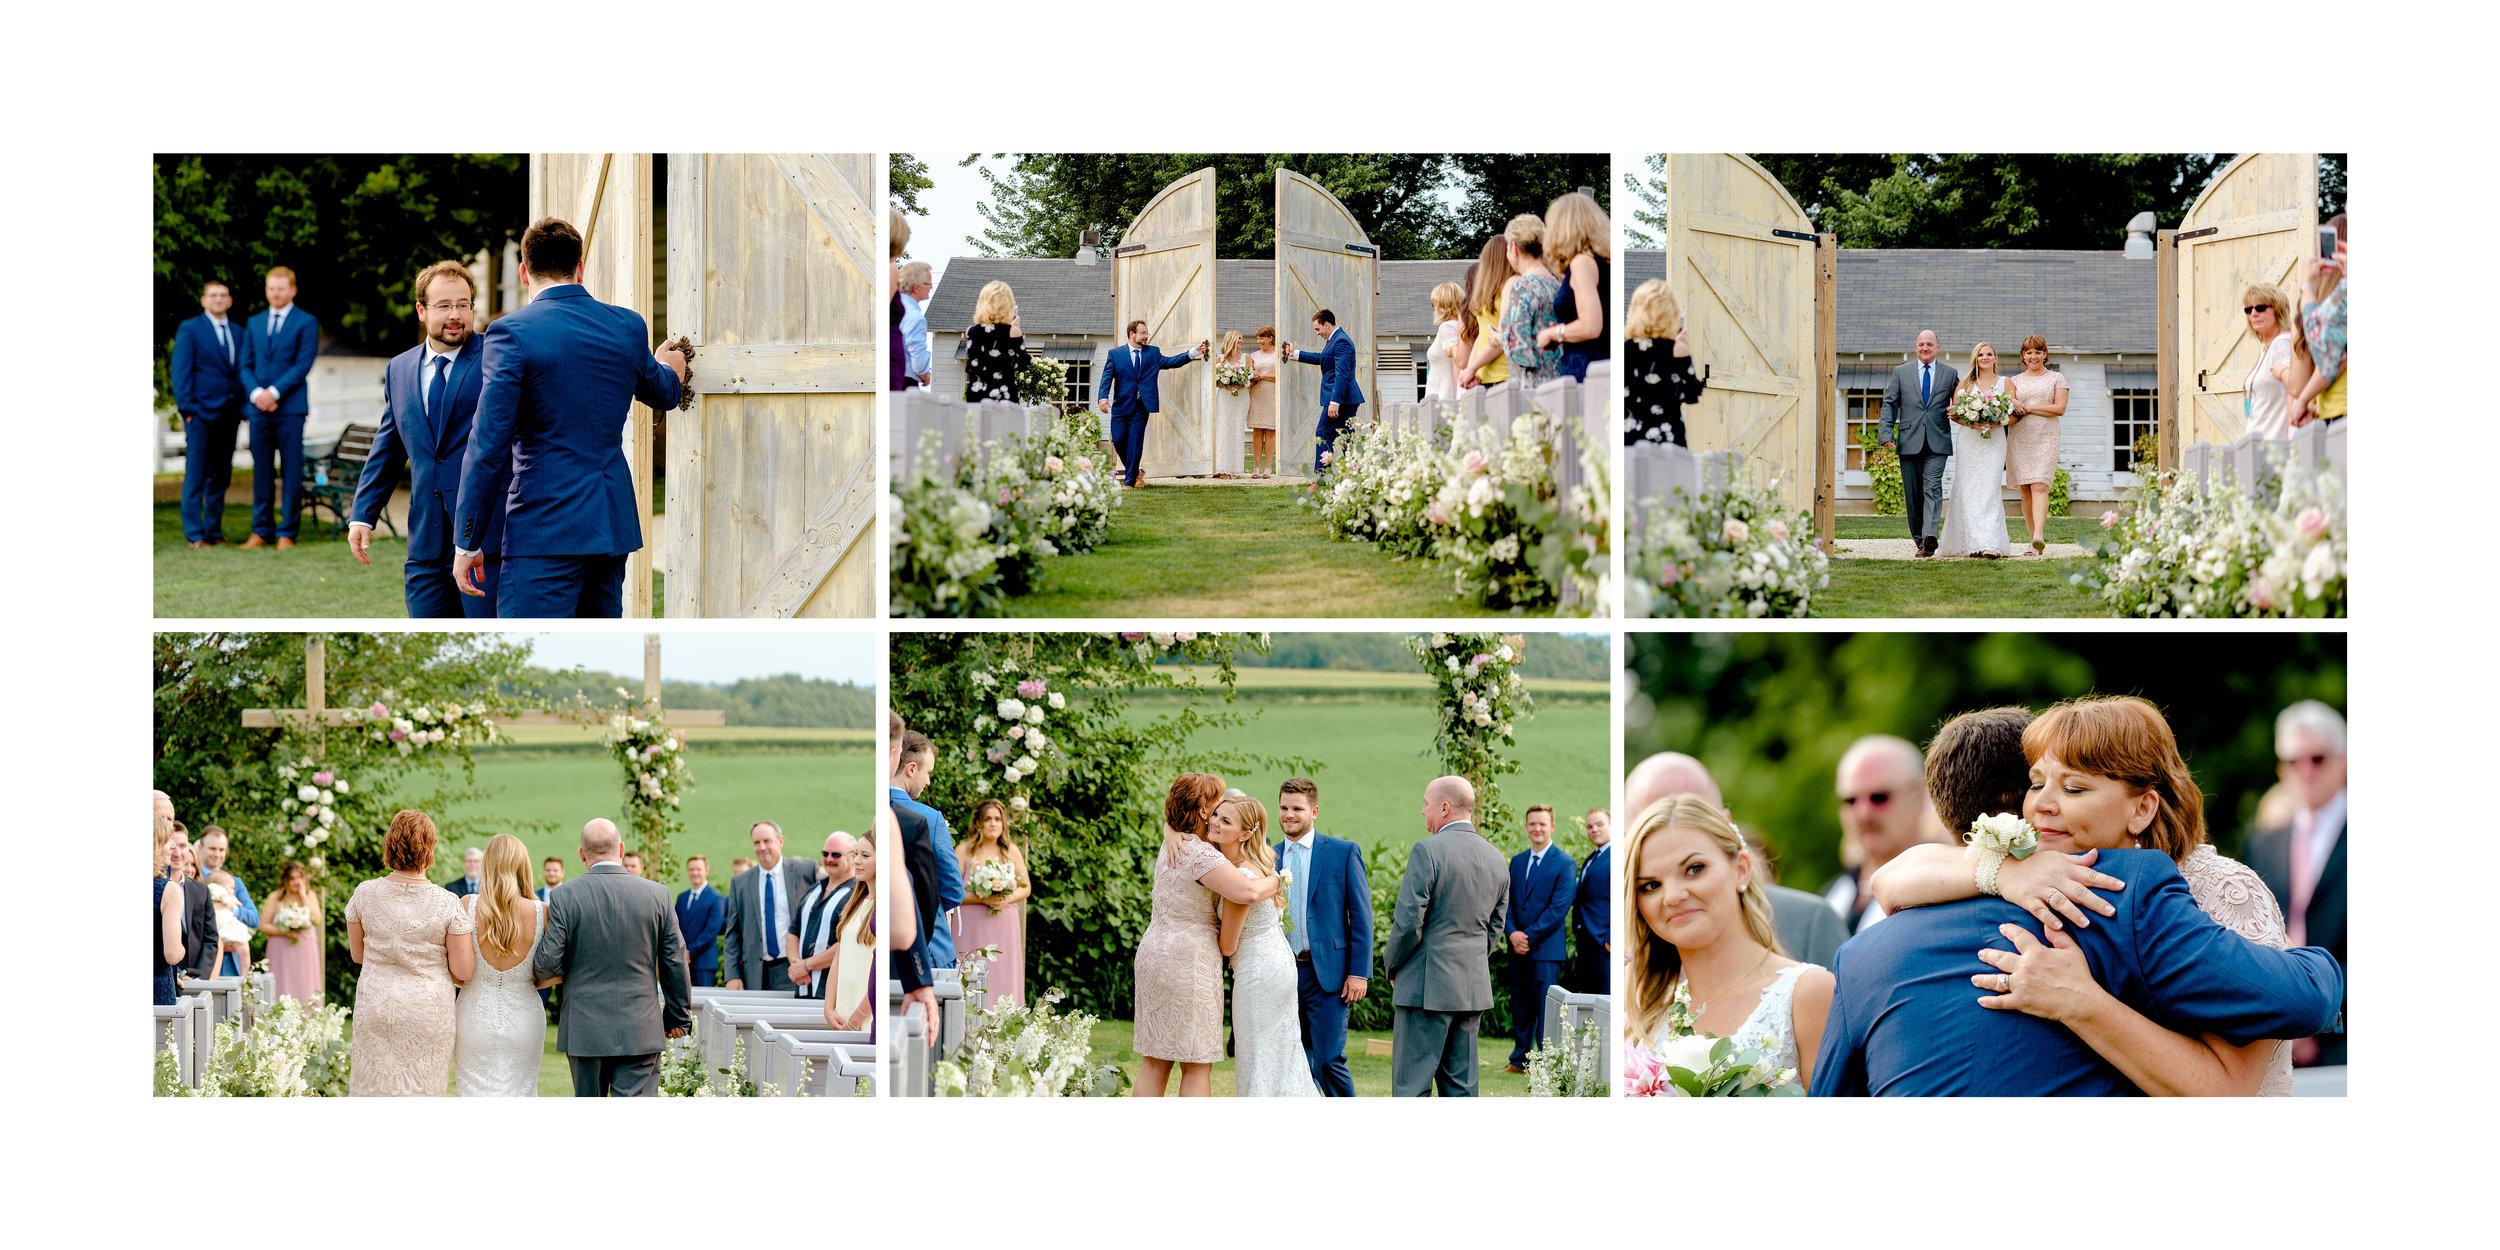 Ashley + Justin - Wedding Album_21.jpg